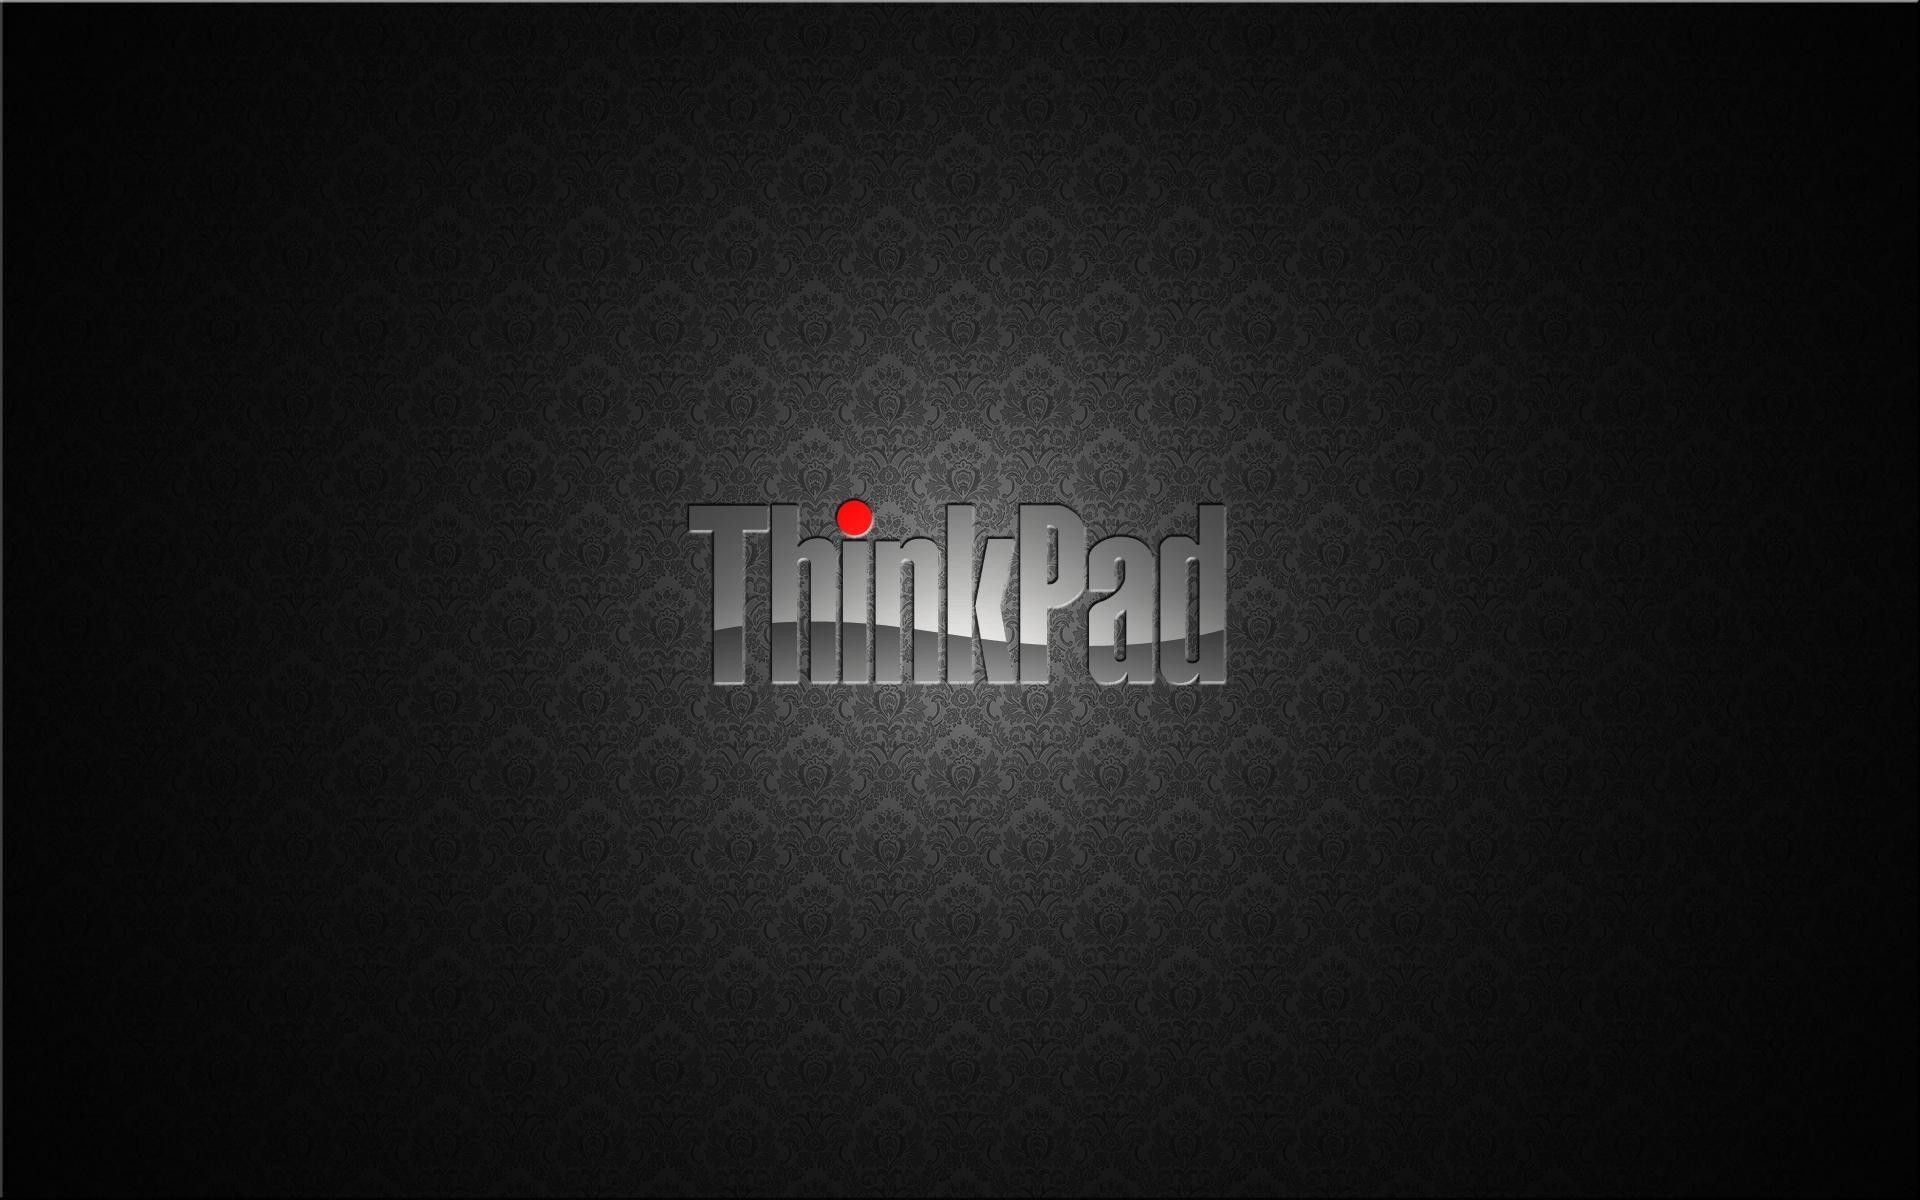 Elegant Lenovo Thinkpad Wallpaper Dengan Gambar